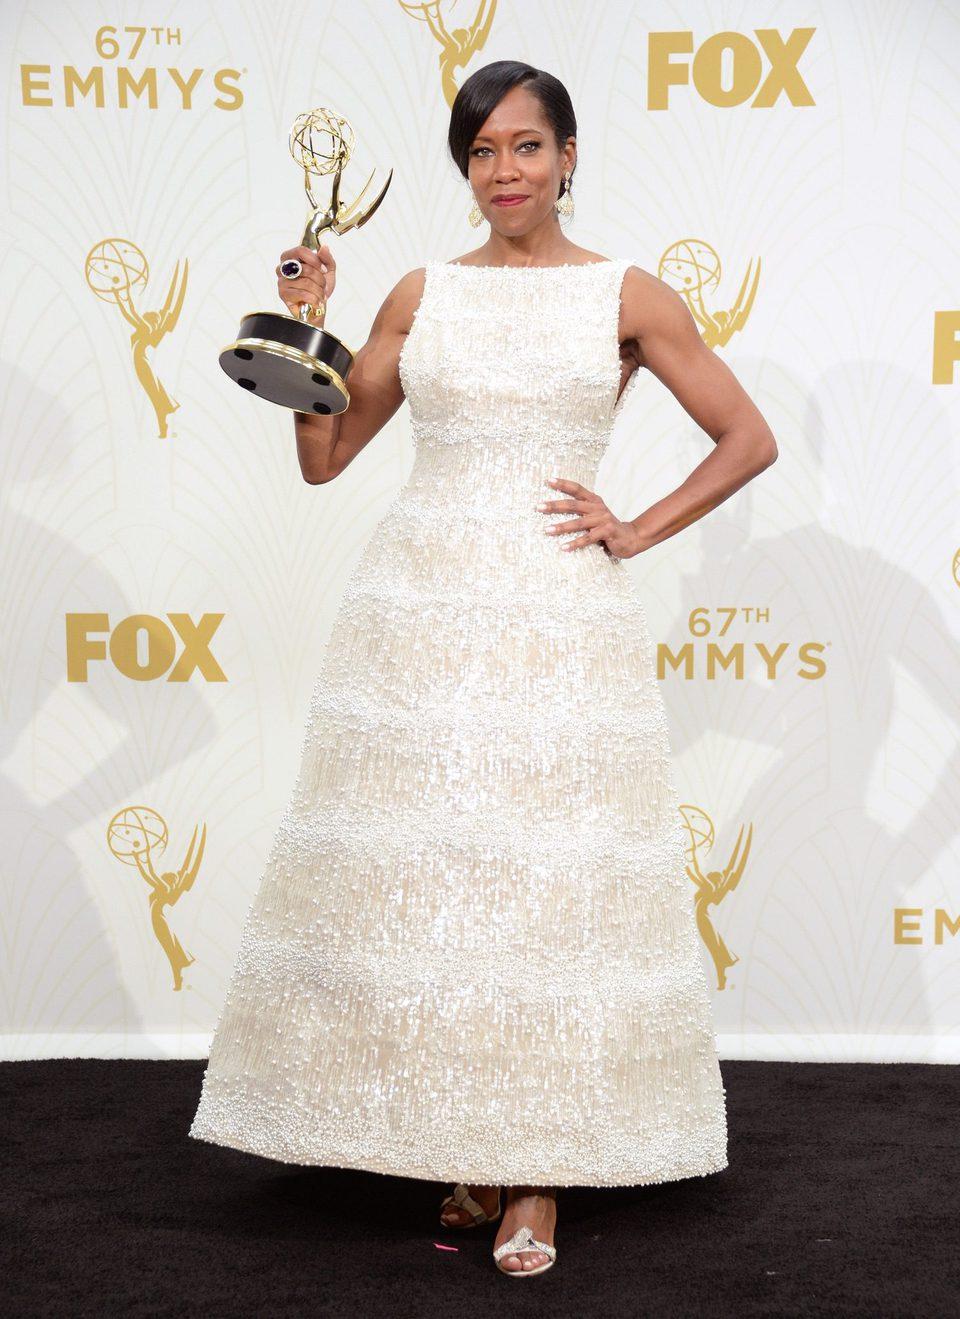 Regina King posando con su Premio Emmy 2015